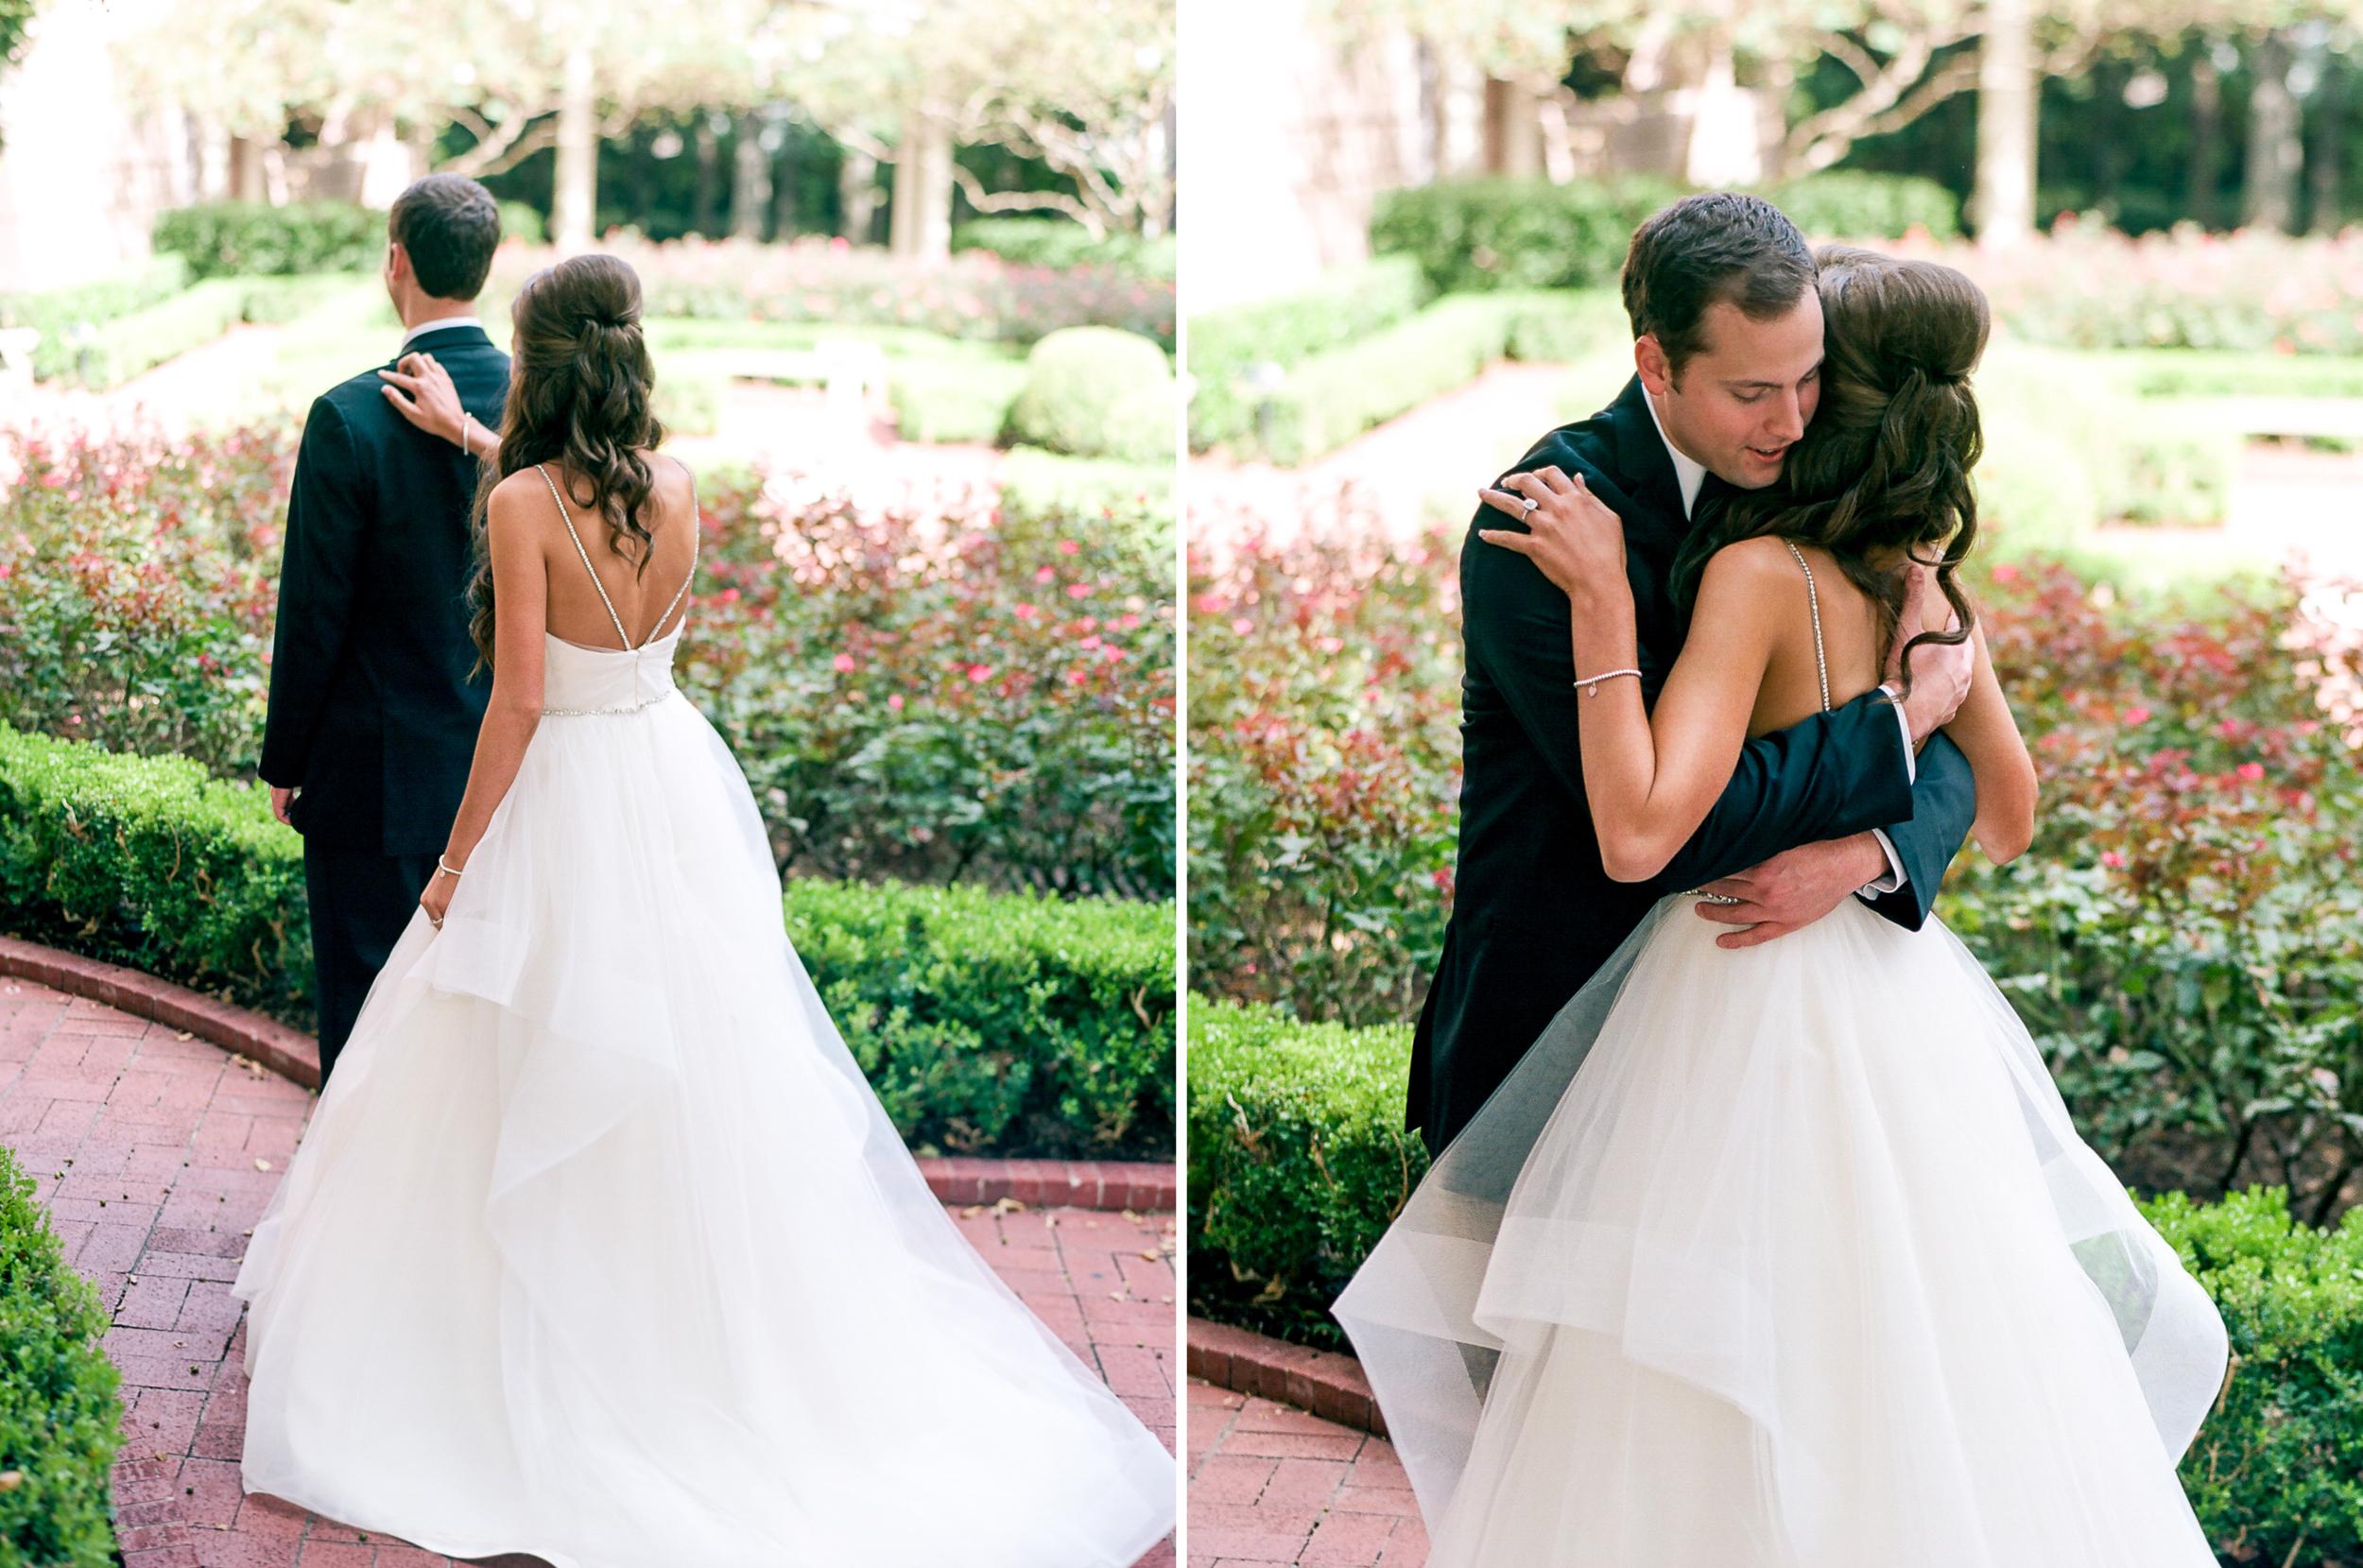 Dana-Fernandez-Photography-Weddings-in-Houston-Magazine-feature-Houston-wedding-photographer-film-122.jpg